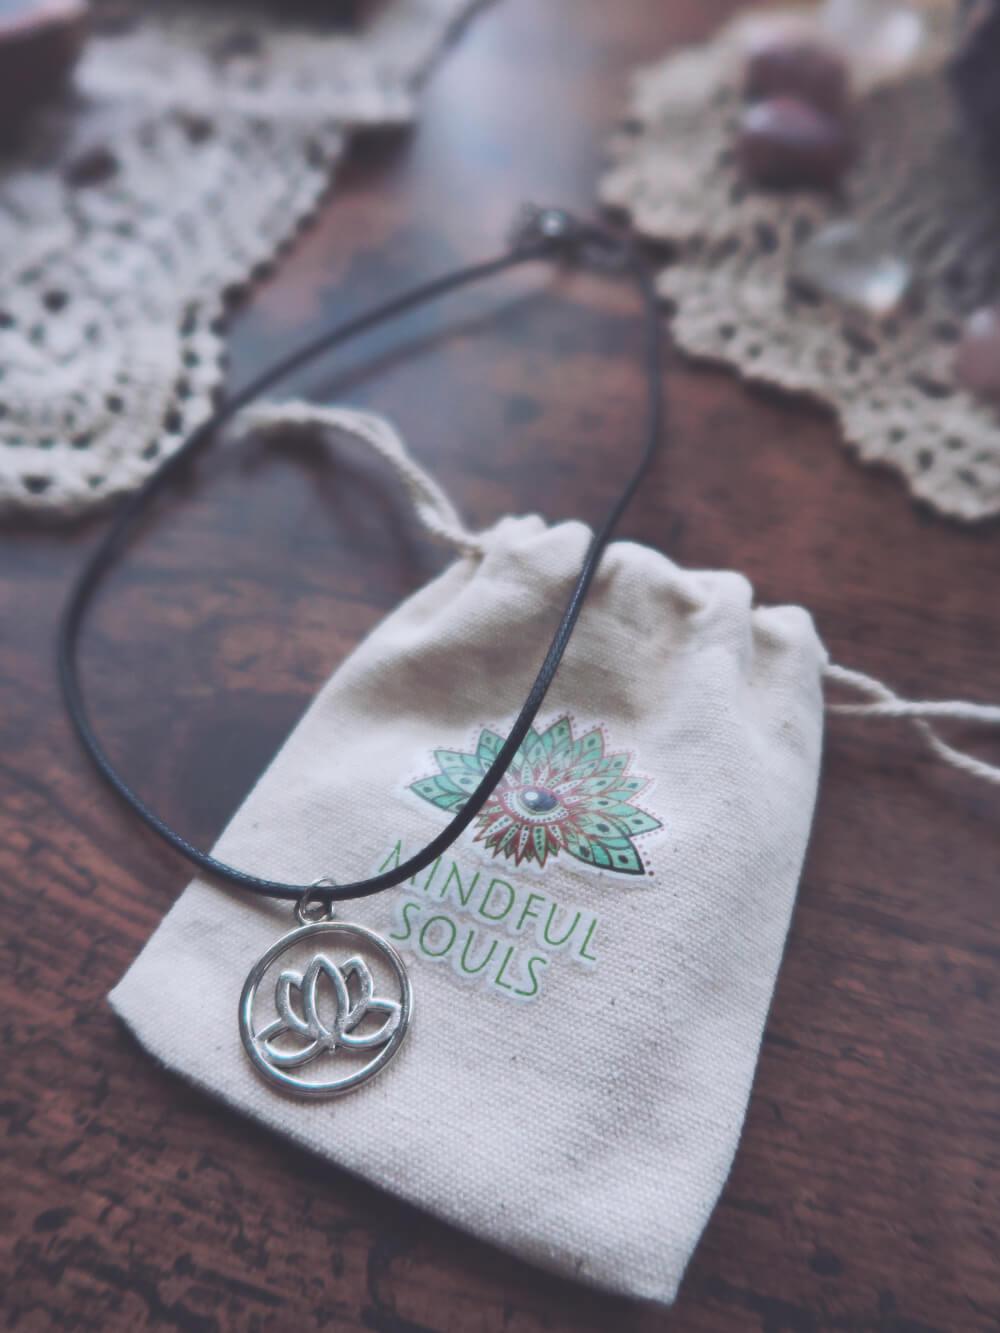 Lotus flower necklace